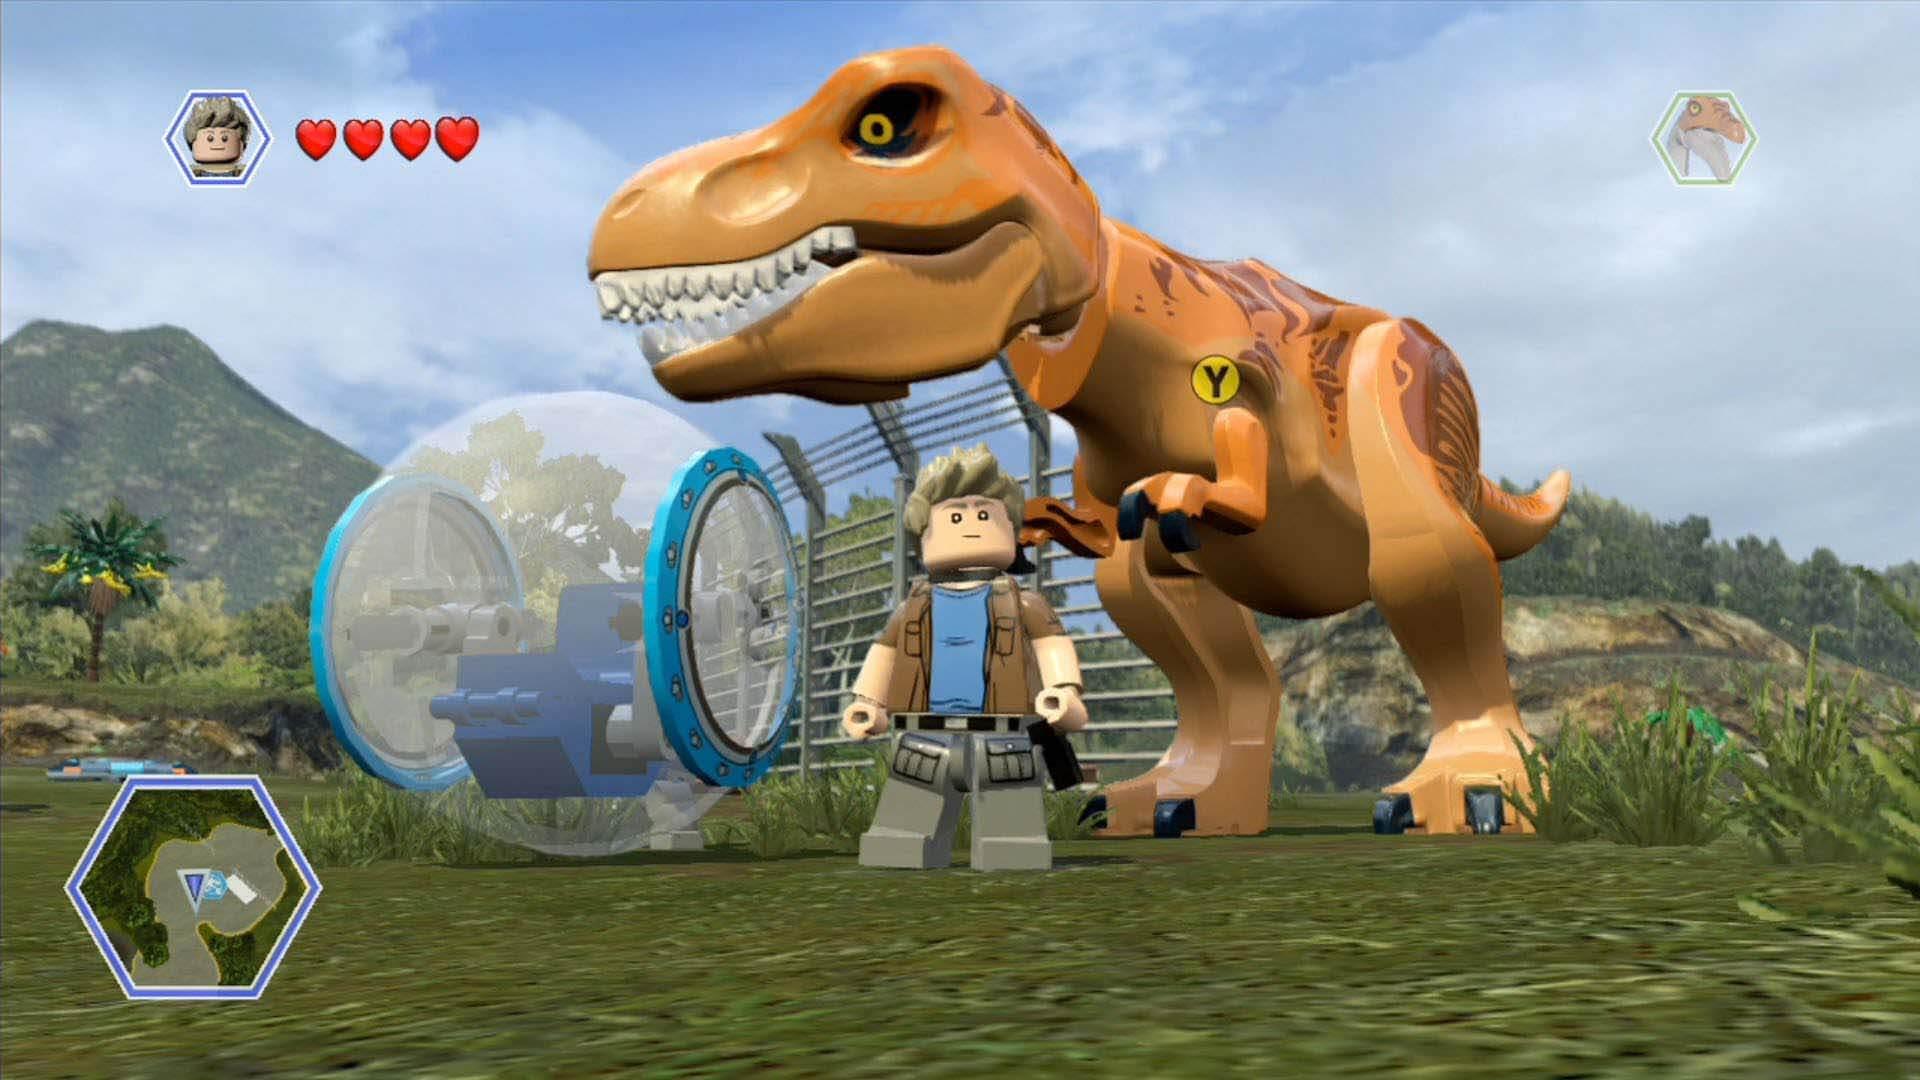 jurassic world lego warner bros